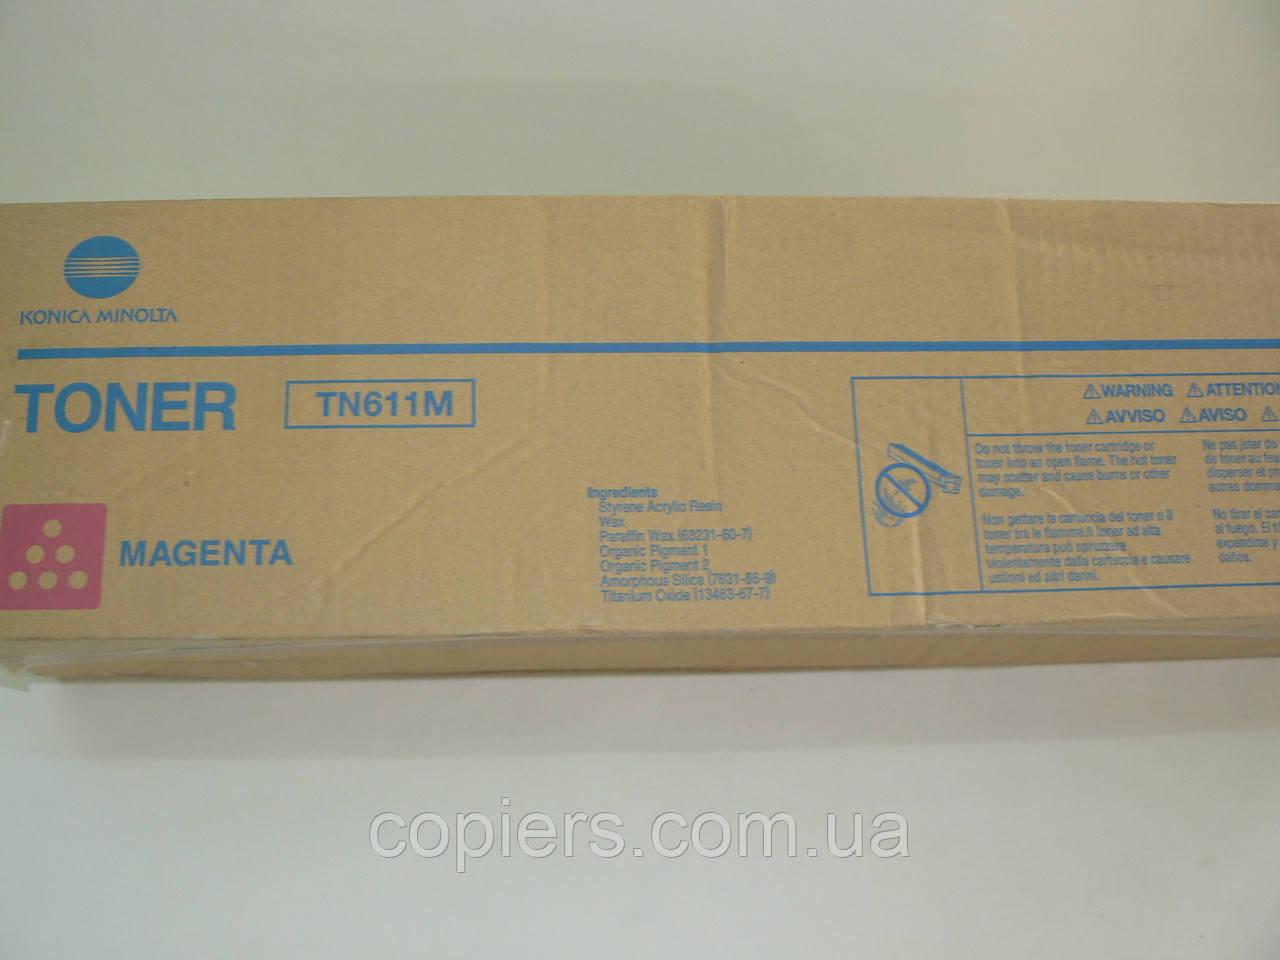 Toner TN611М bizhub C451, C550, C650, 27t, 460g, оригинал Konica Minolta